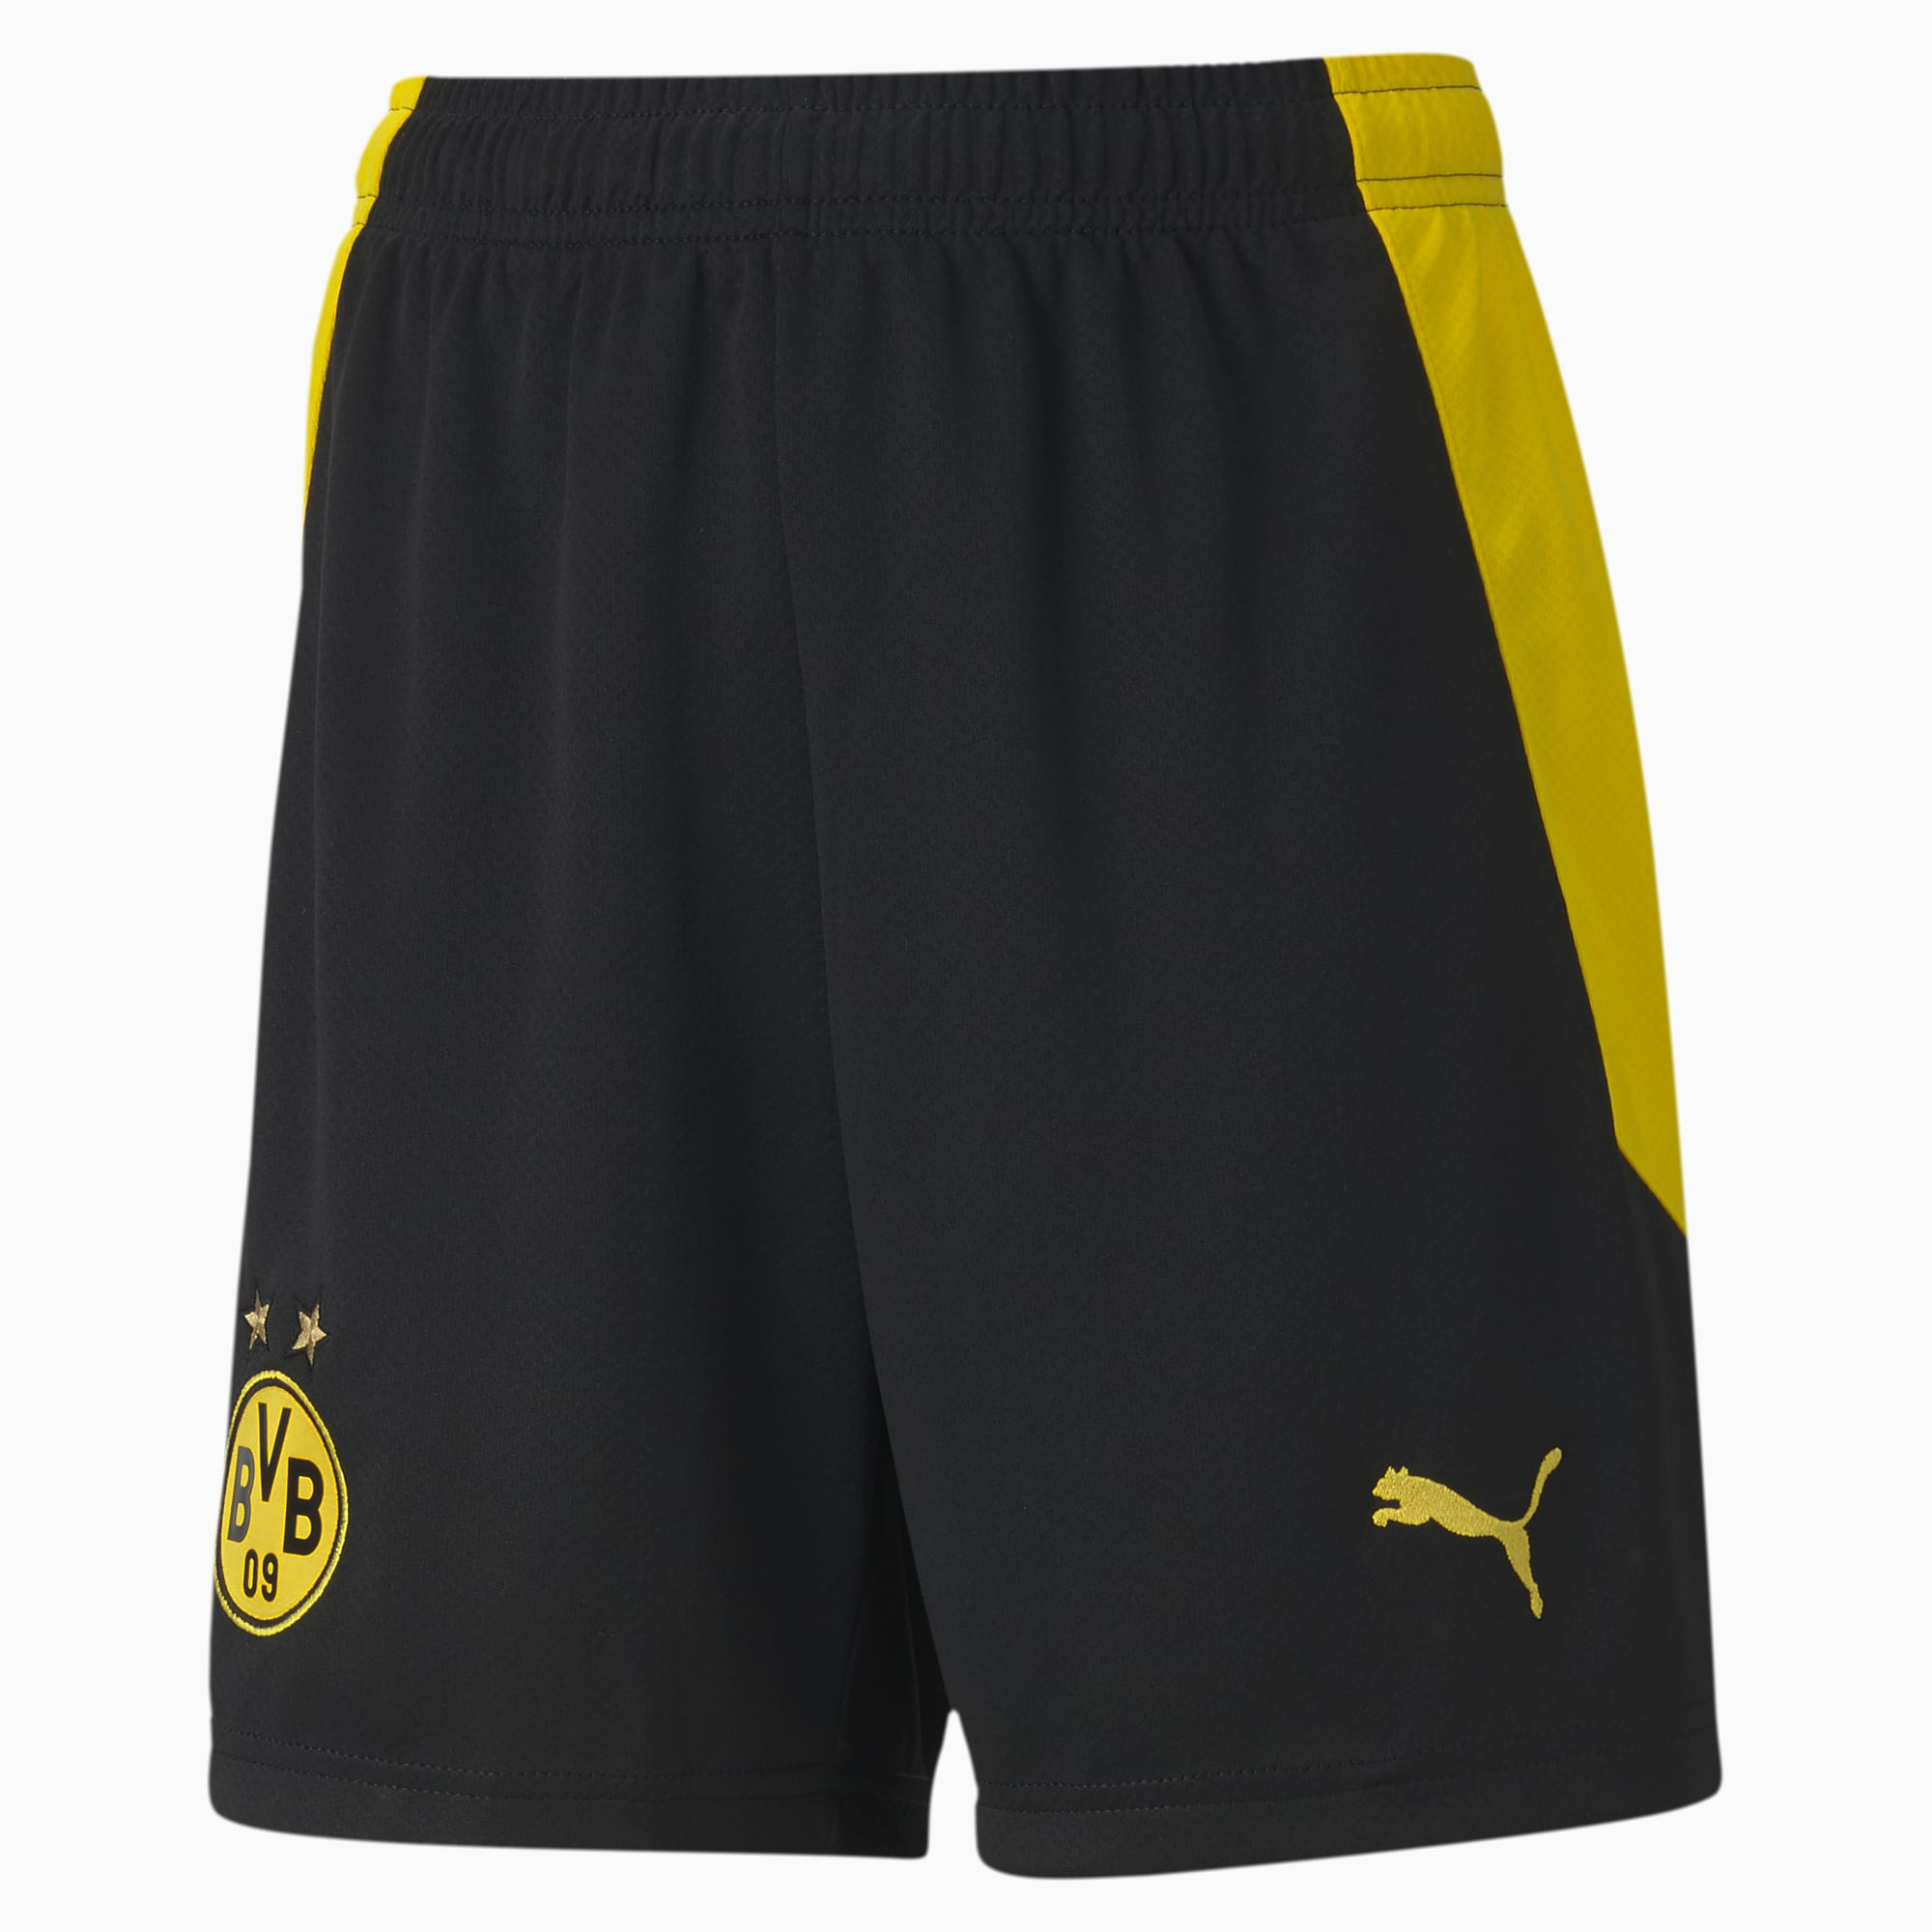 BVB Replica Youth Football Shorts